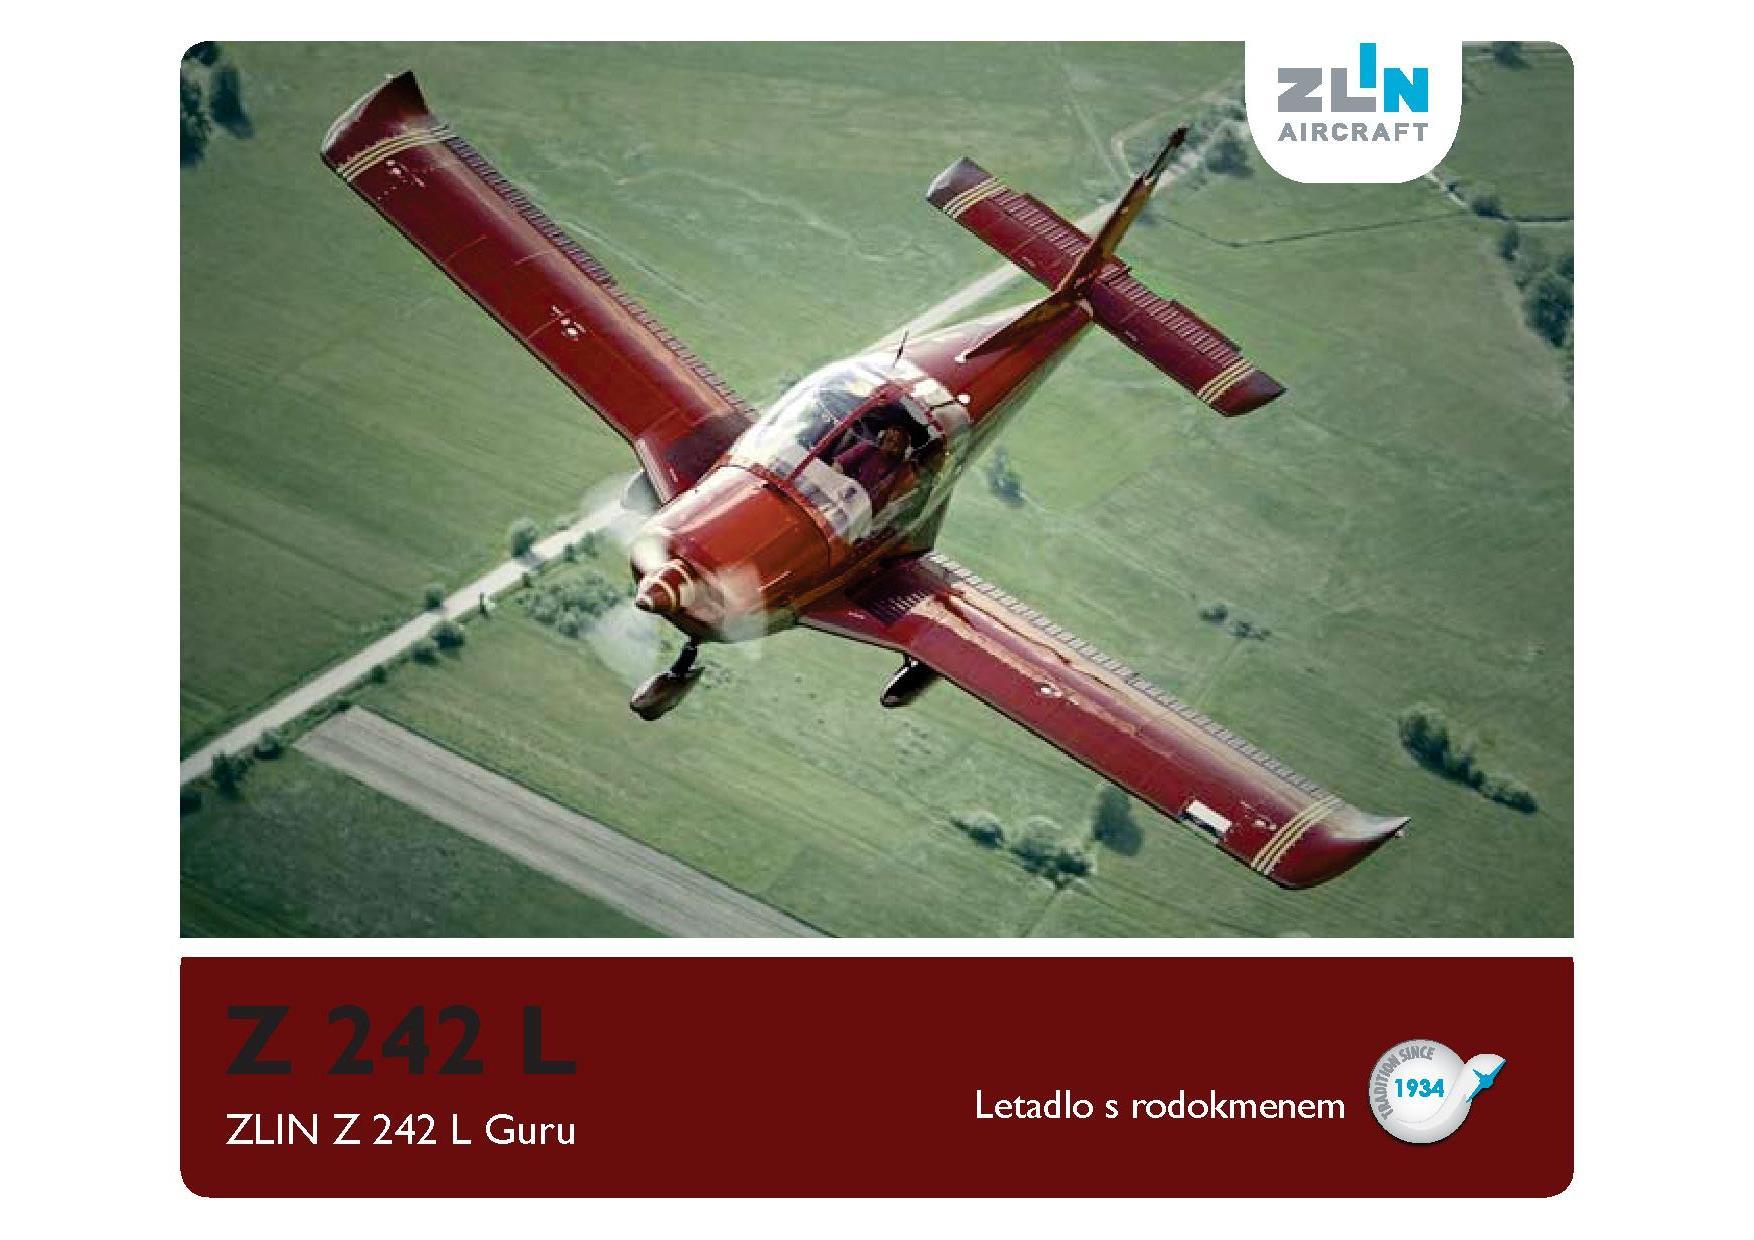 ZLIN_AIRCRAFT_242